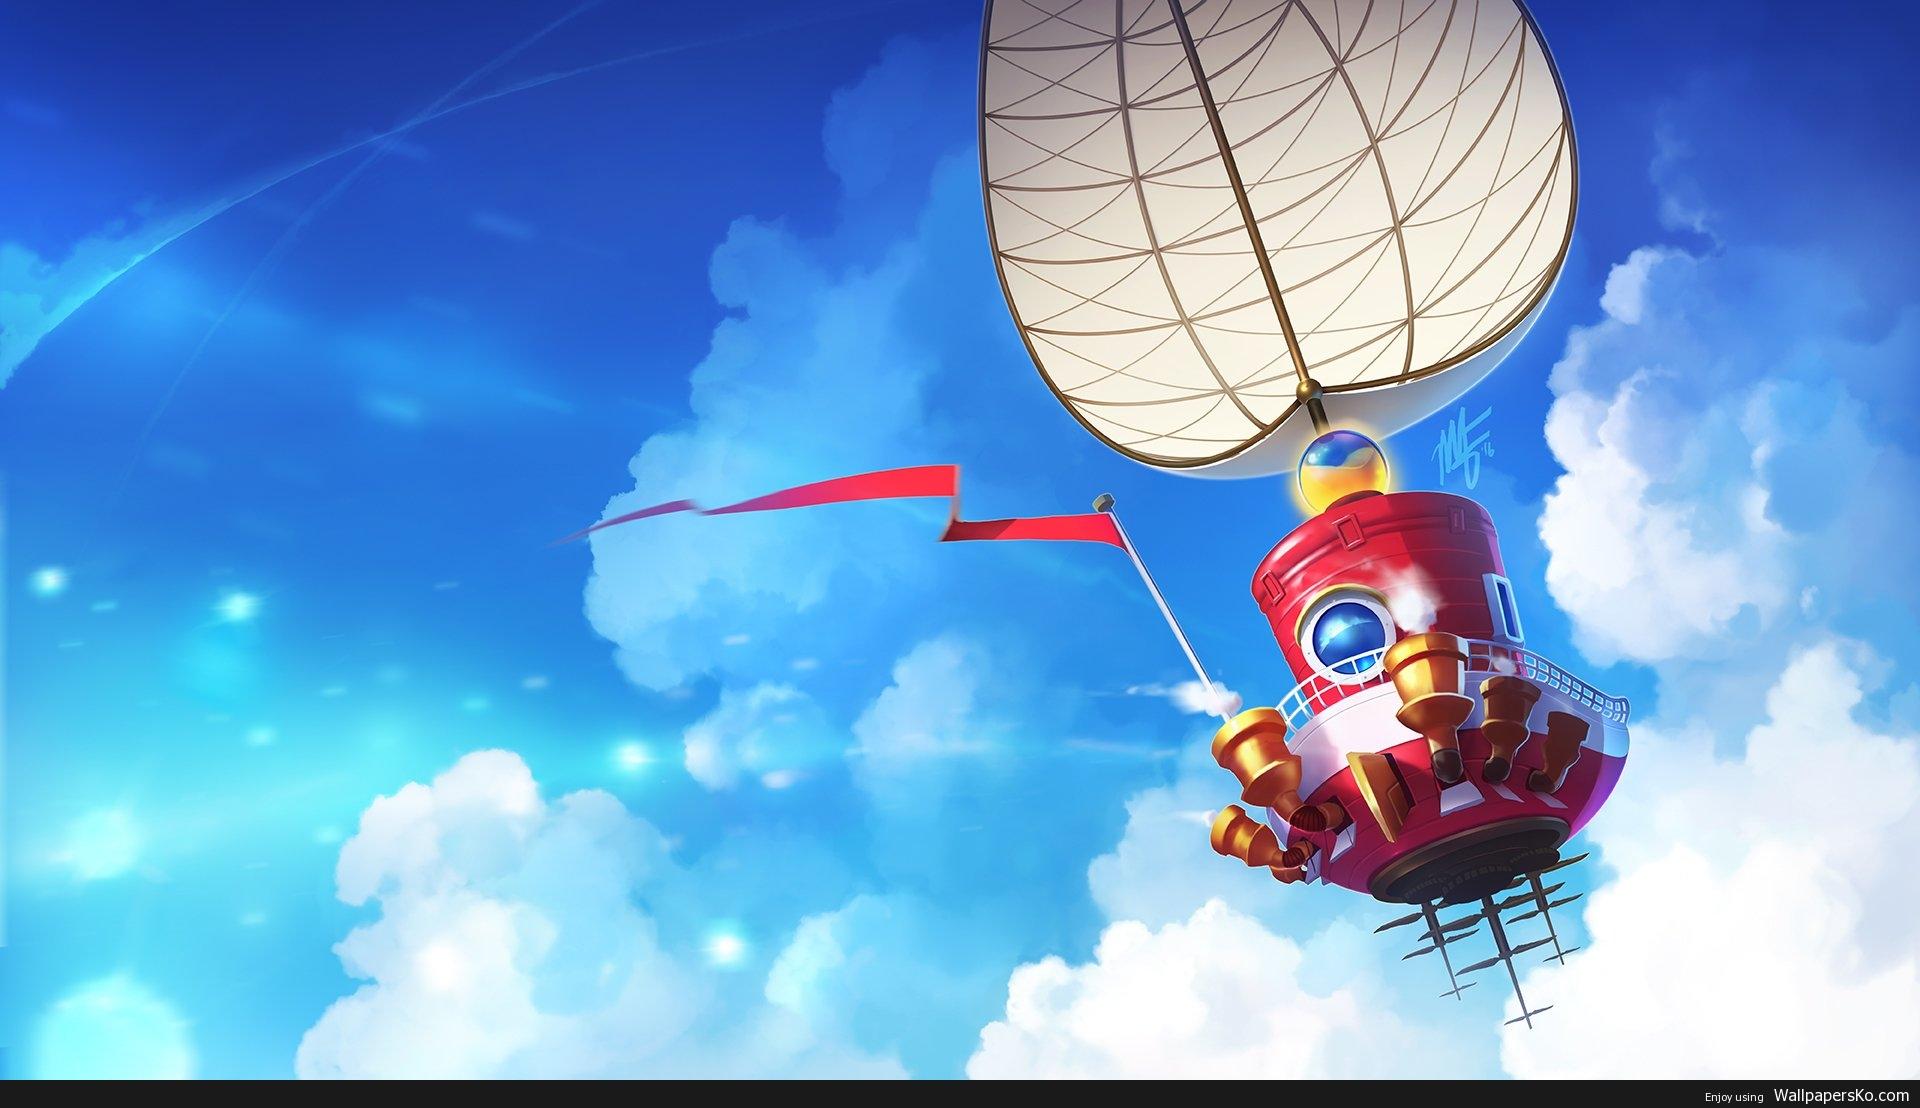 firewatch wallpaper,sky,cartoon,animated cartoon,illustration,cloud